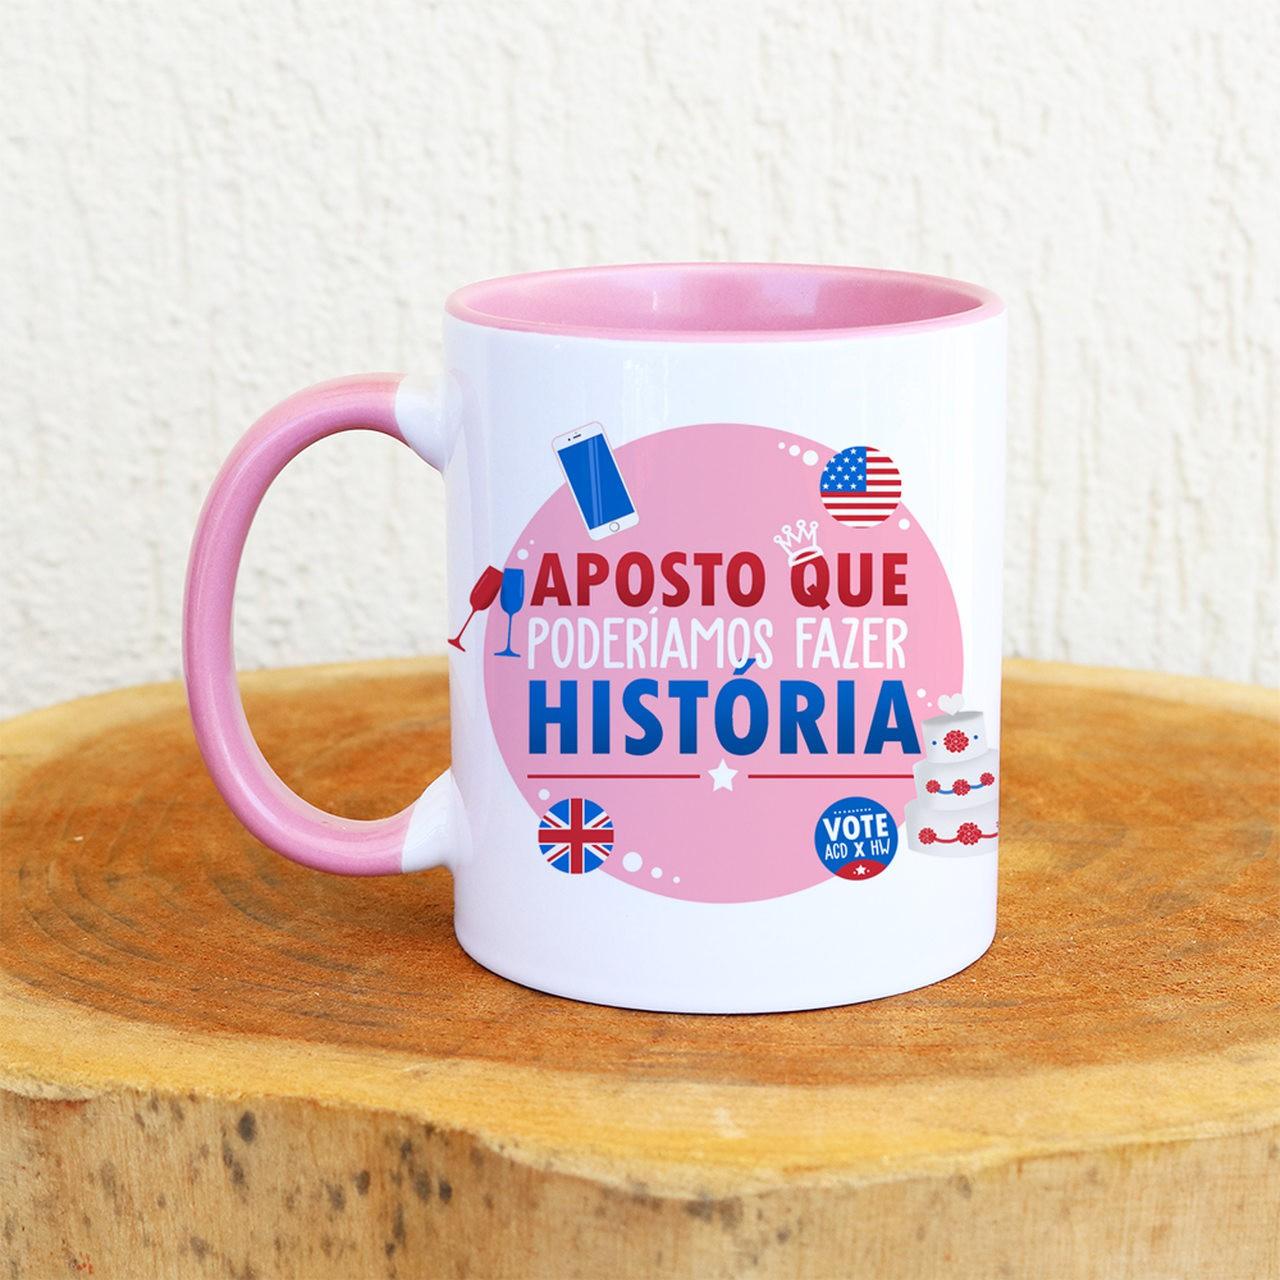 Caneca Aposto Que Poderíamos Fazer História